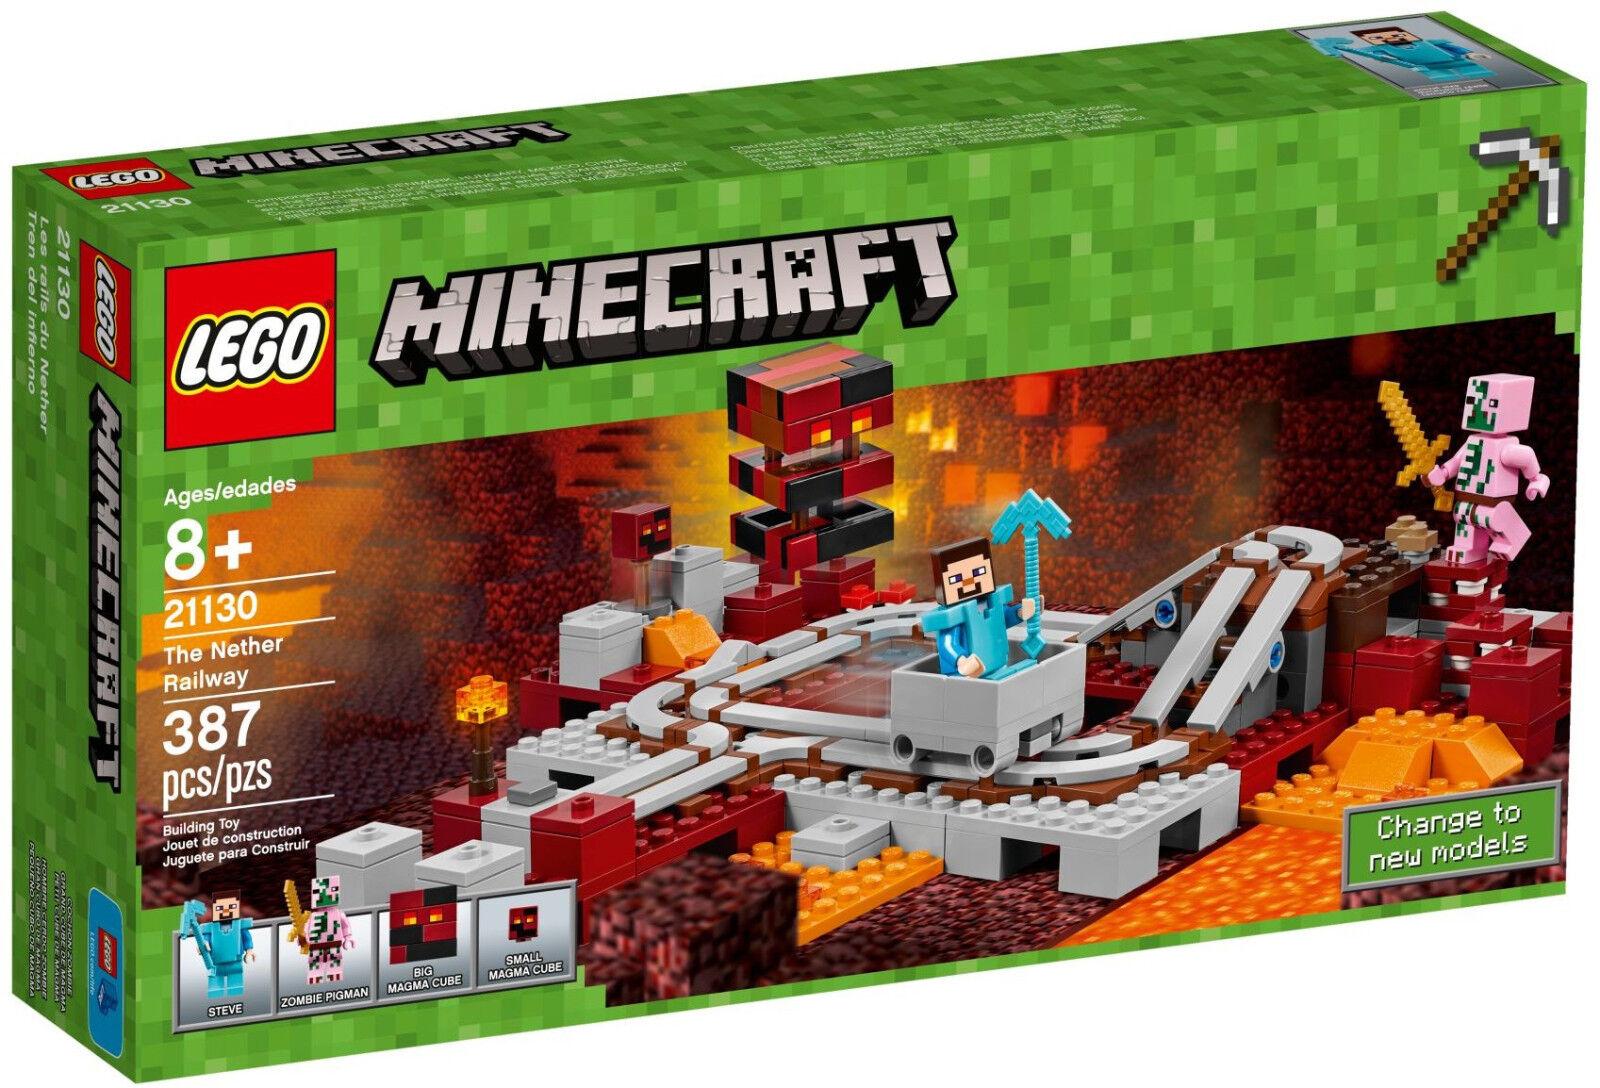 Lego Minecraft - 21130 la Nether-ferrocarril The Nether Railway-nuevo embalaje original